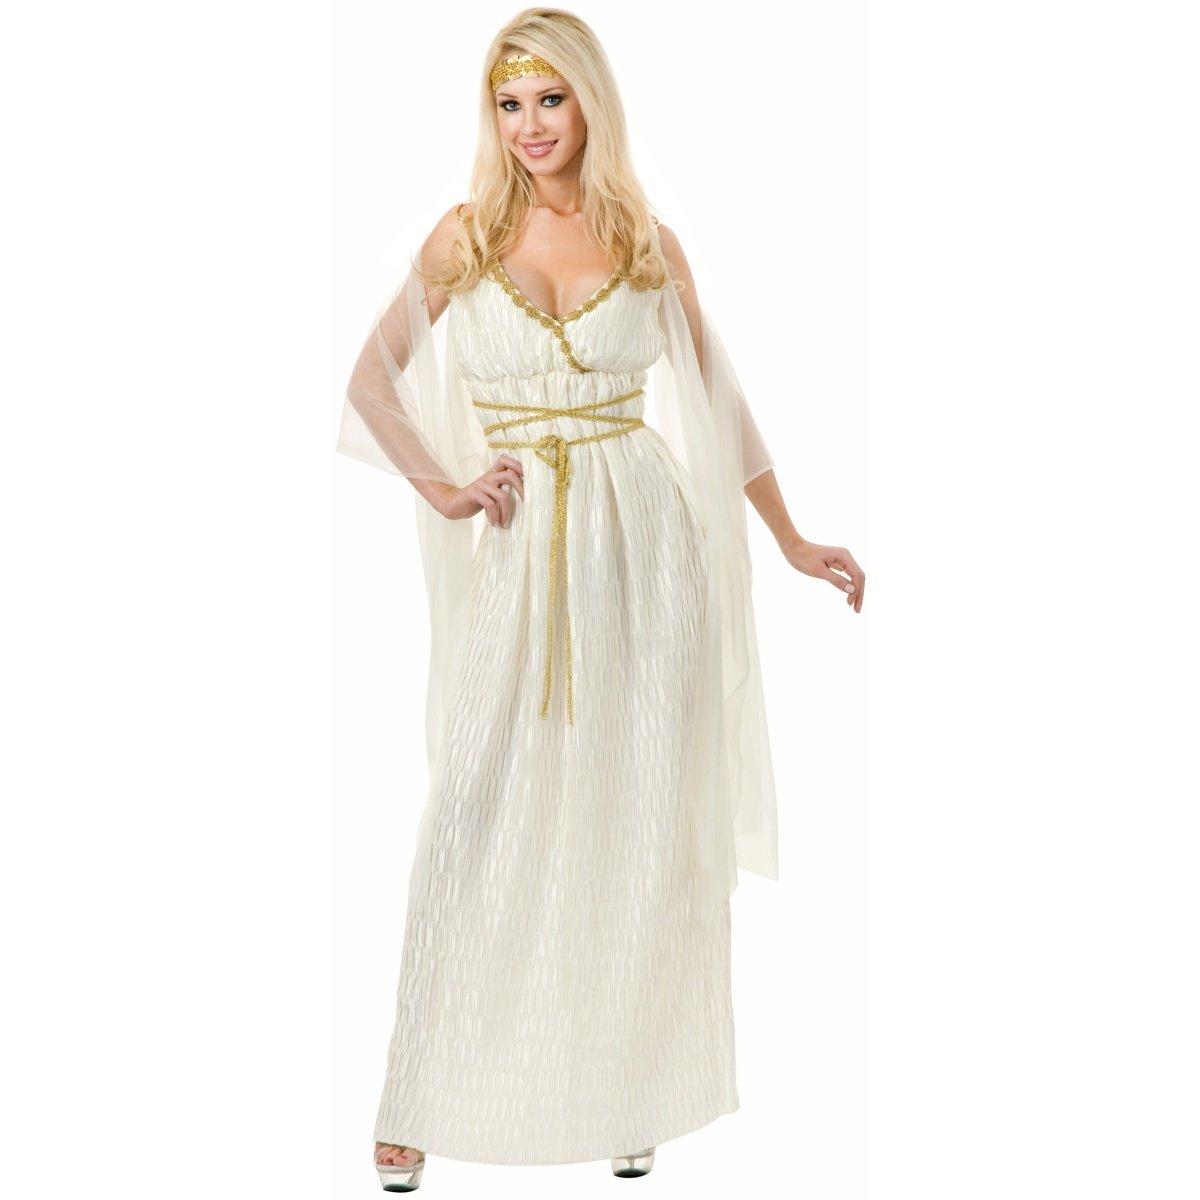 Grecian Princess Adult Costume - Large